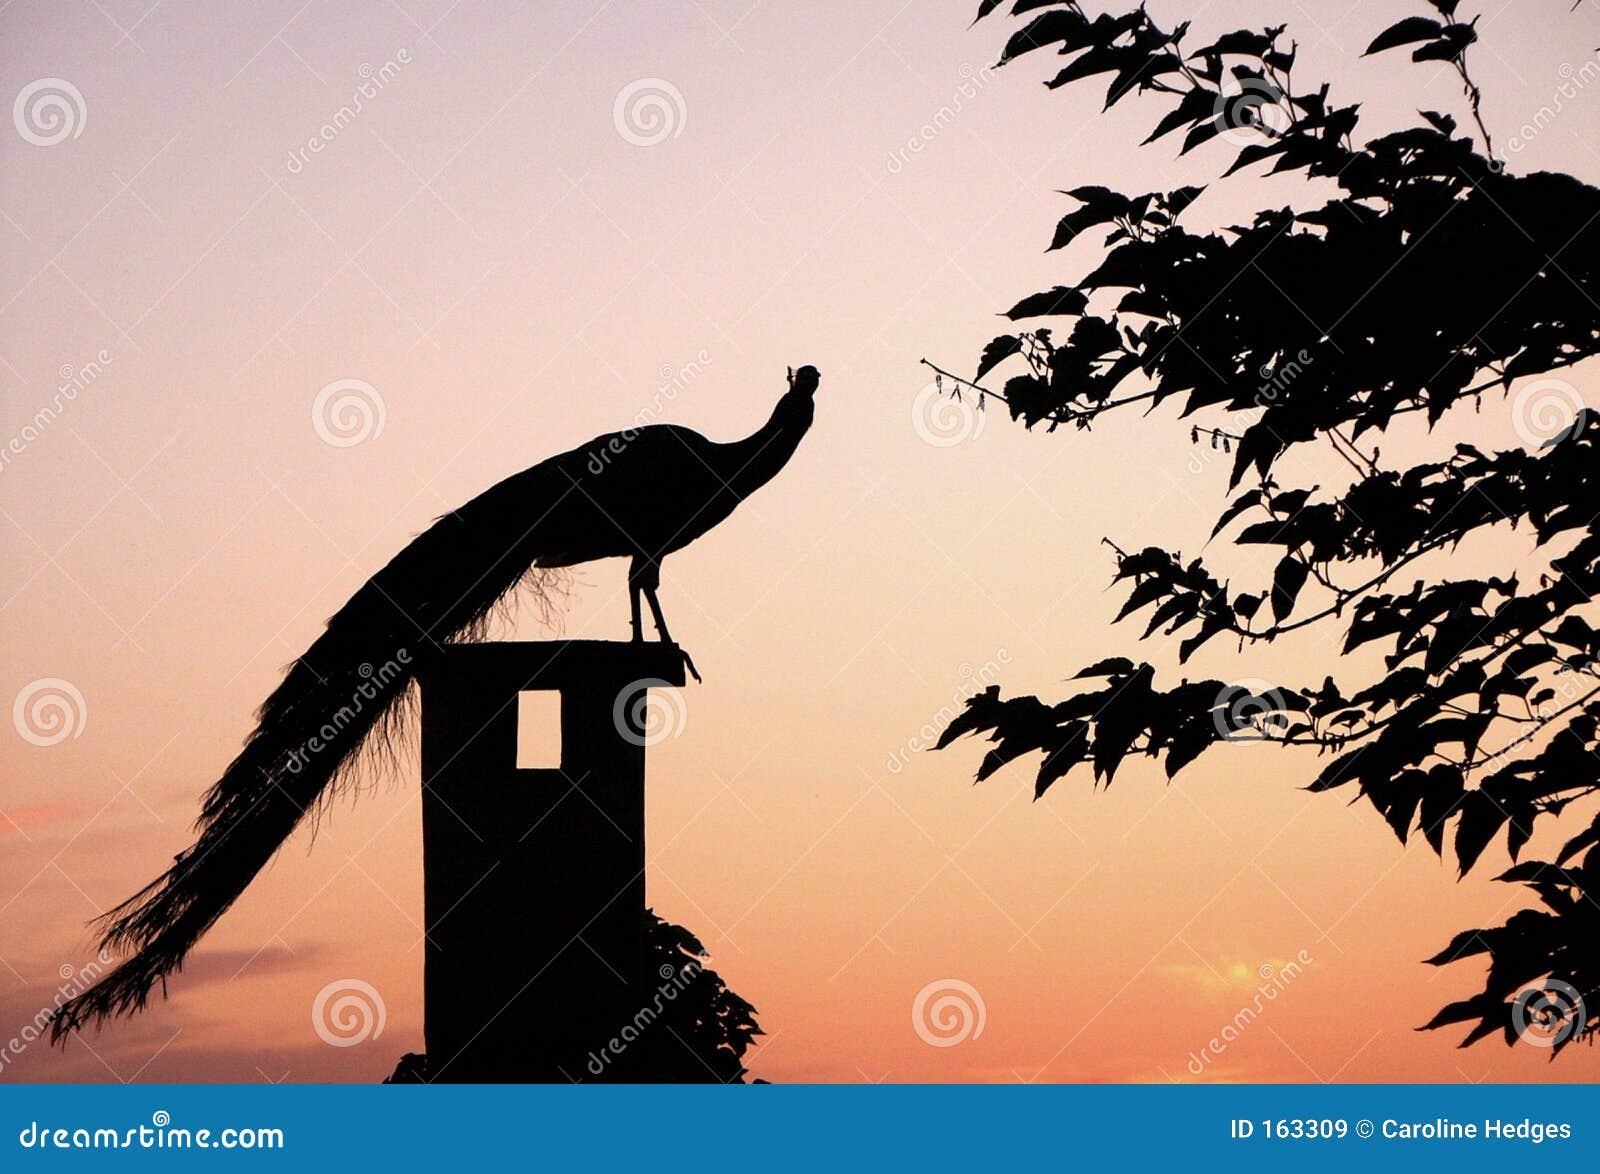 Sunset Peacock